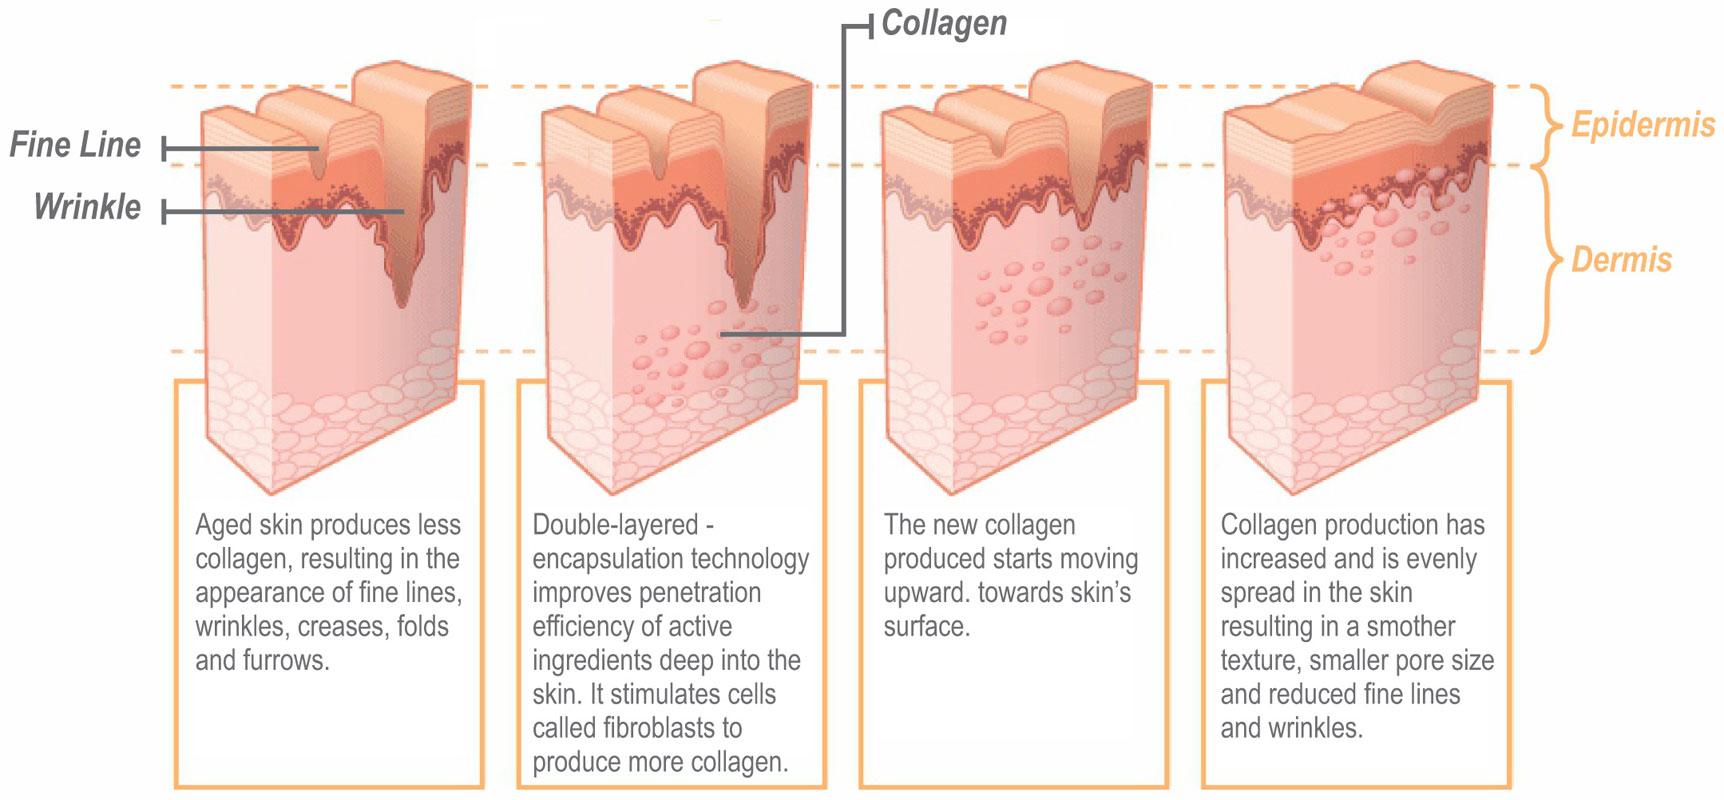 collagen-production